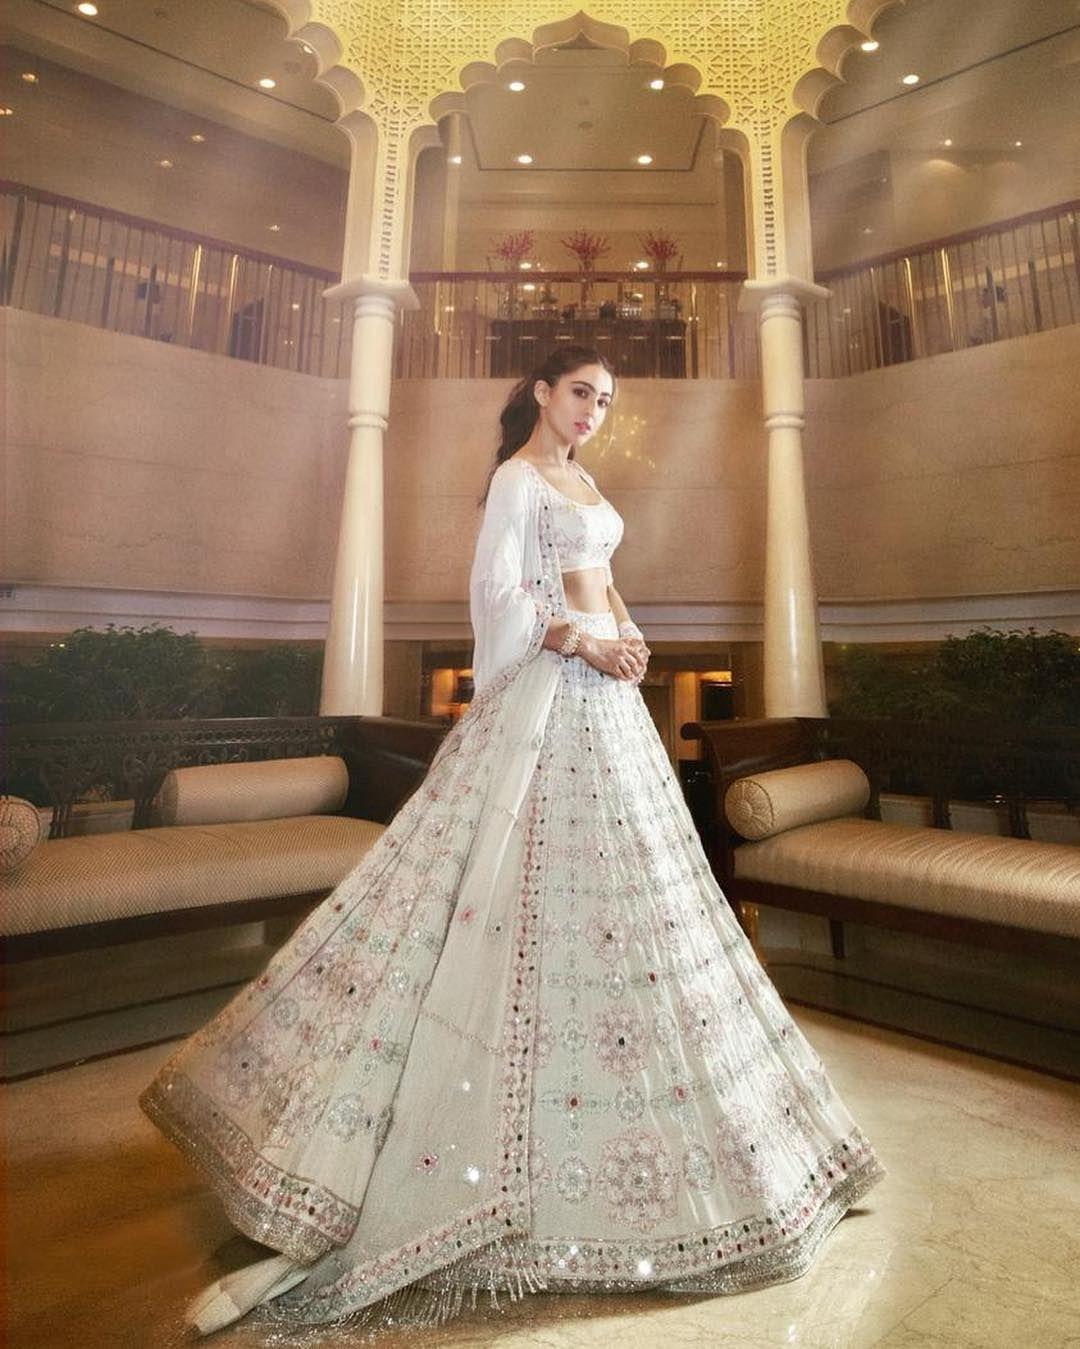 Stunning Sara Ali Khan | Indian wedding dress, Indian outfits, Designer dresses indian